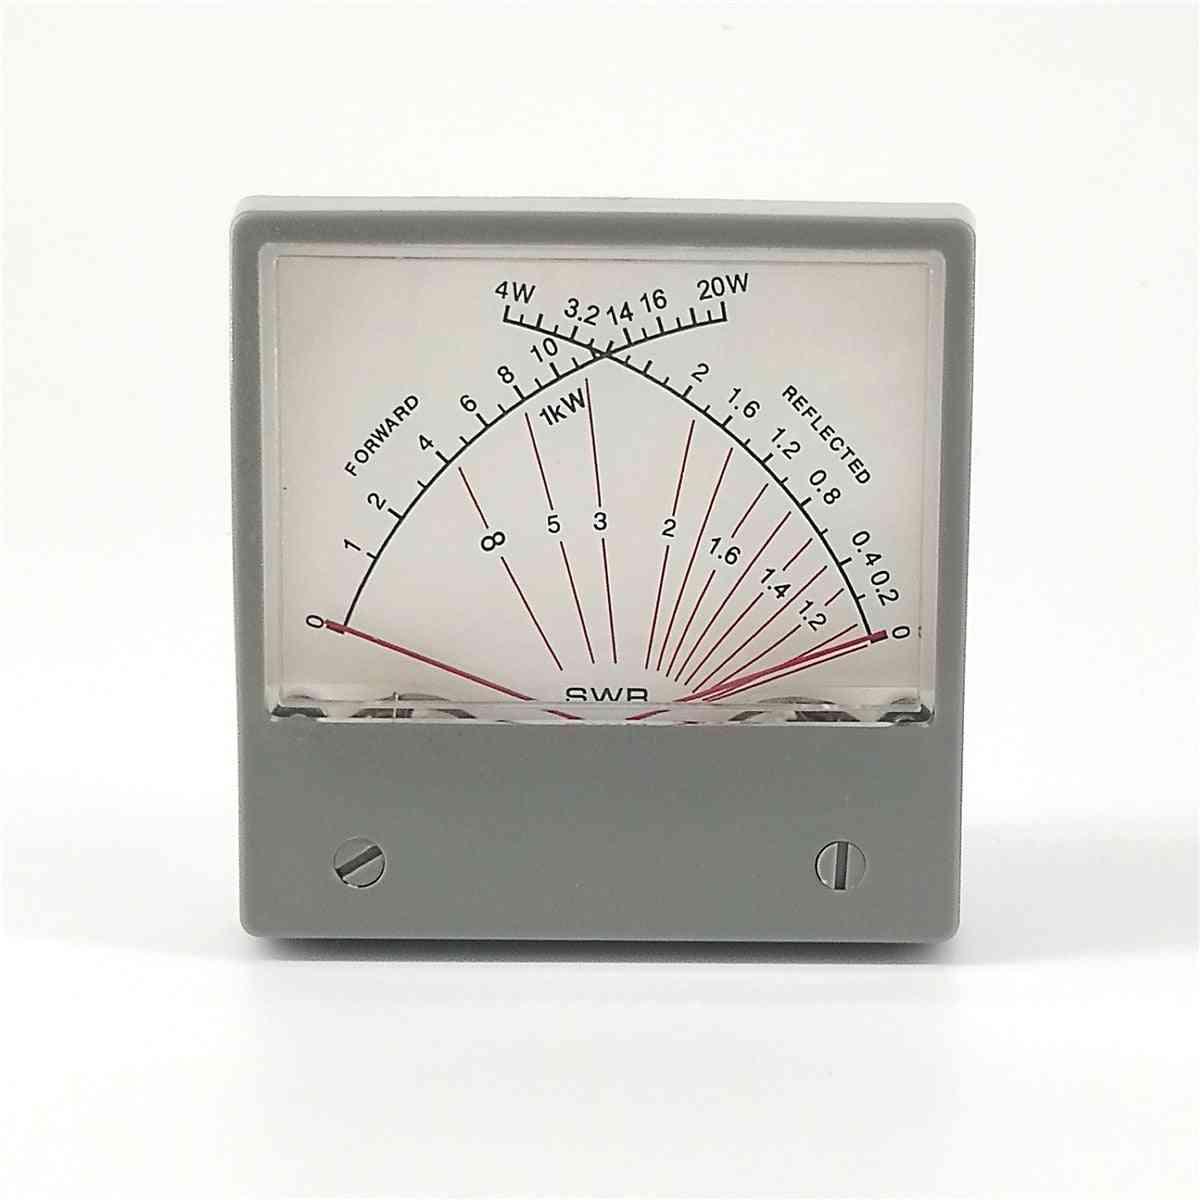 Stationary Wave Ratio Forwad Swr Meter Dual Meter Forward 20w Reflected 4w Radio Hf Sz-70-1